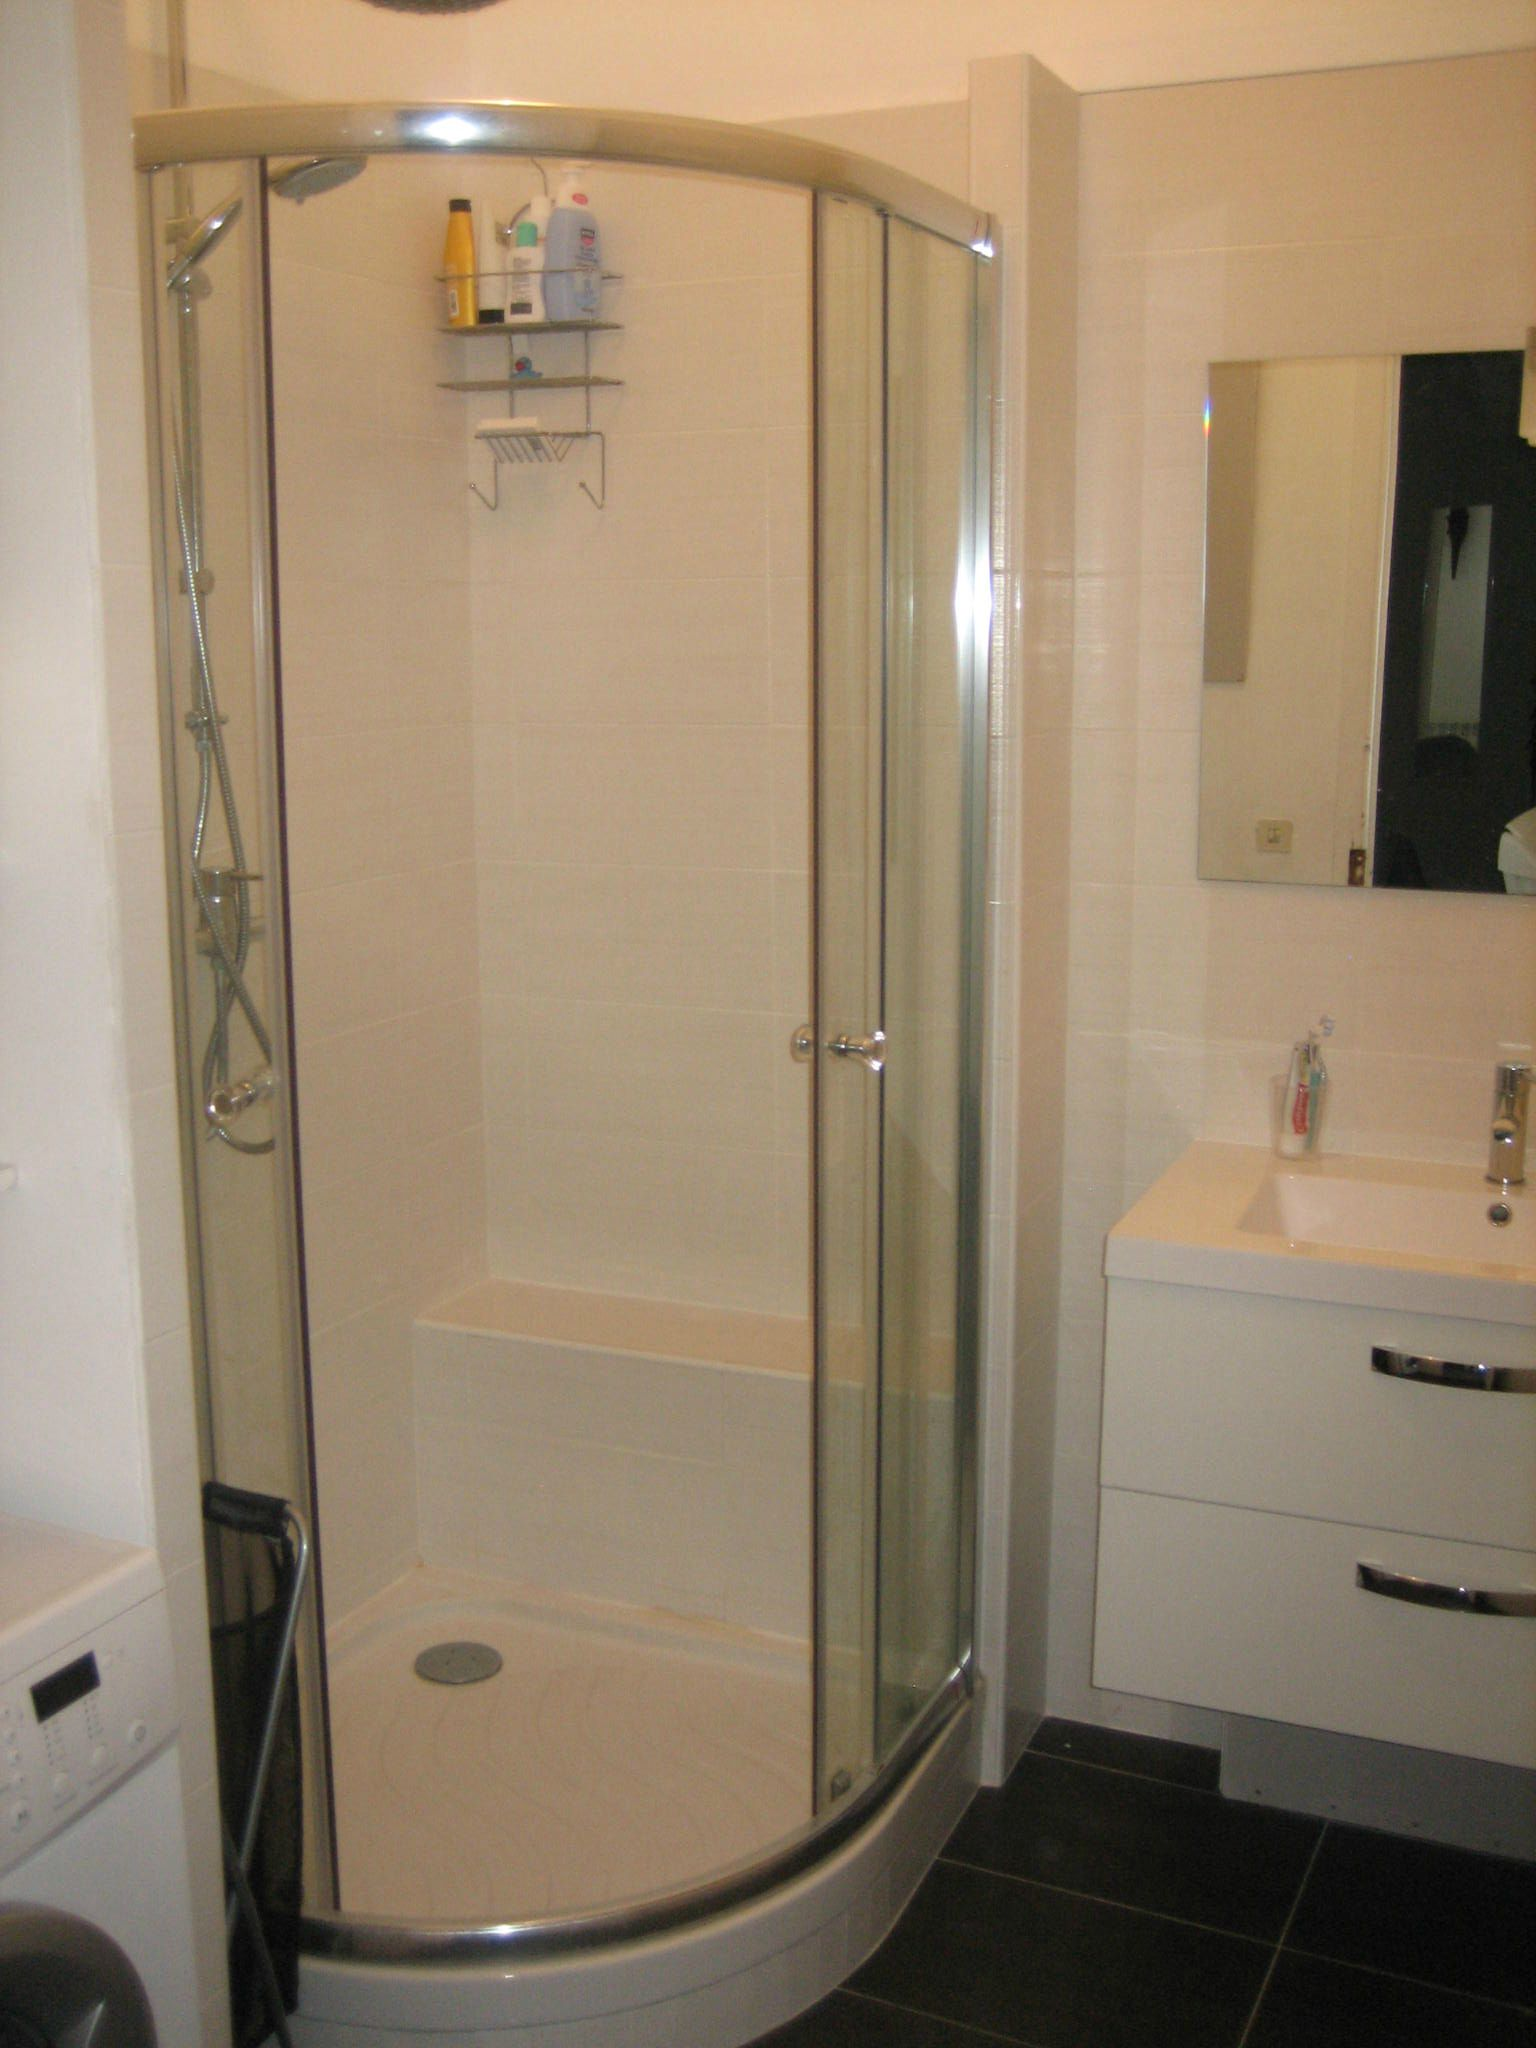 salle de bain quip e douche vier radiateur s che. Black Bedroom Furniture Sets. Home Design Ideas